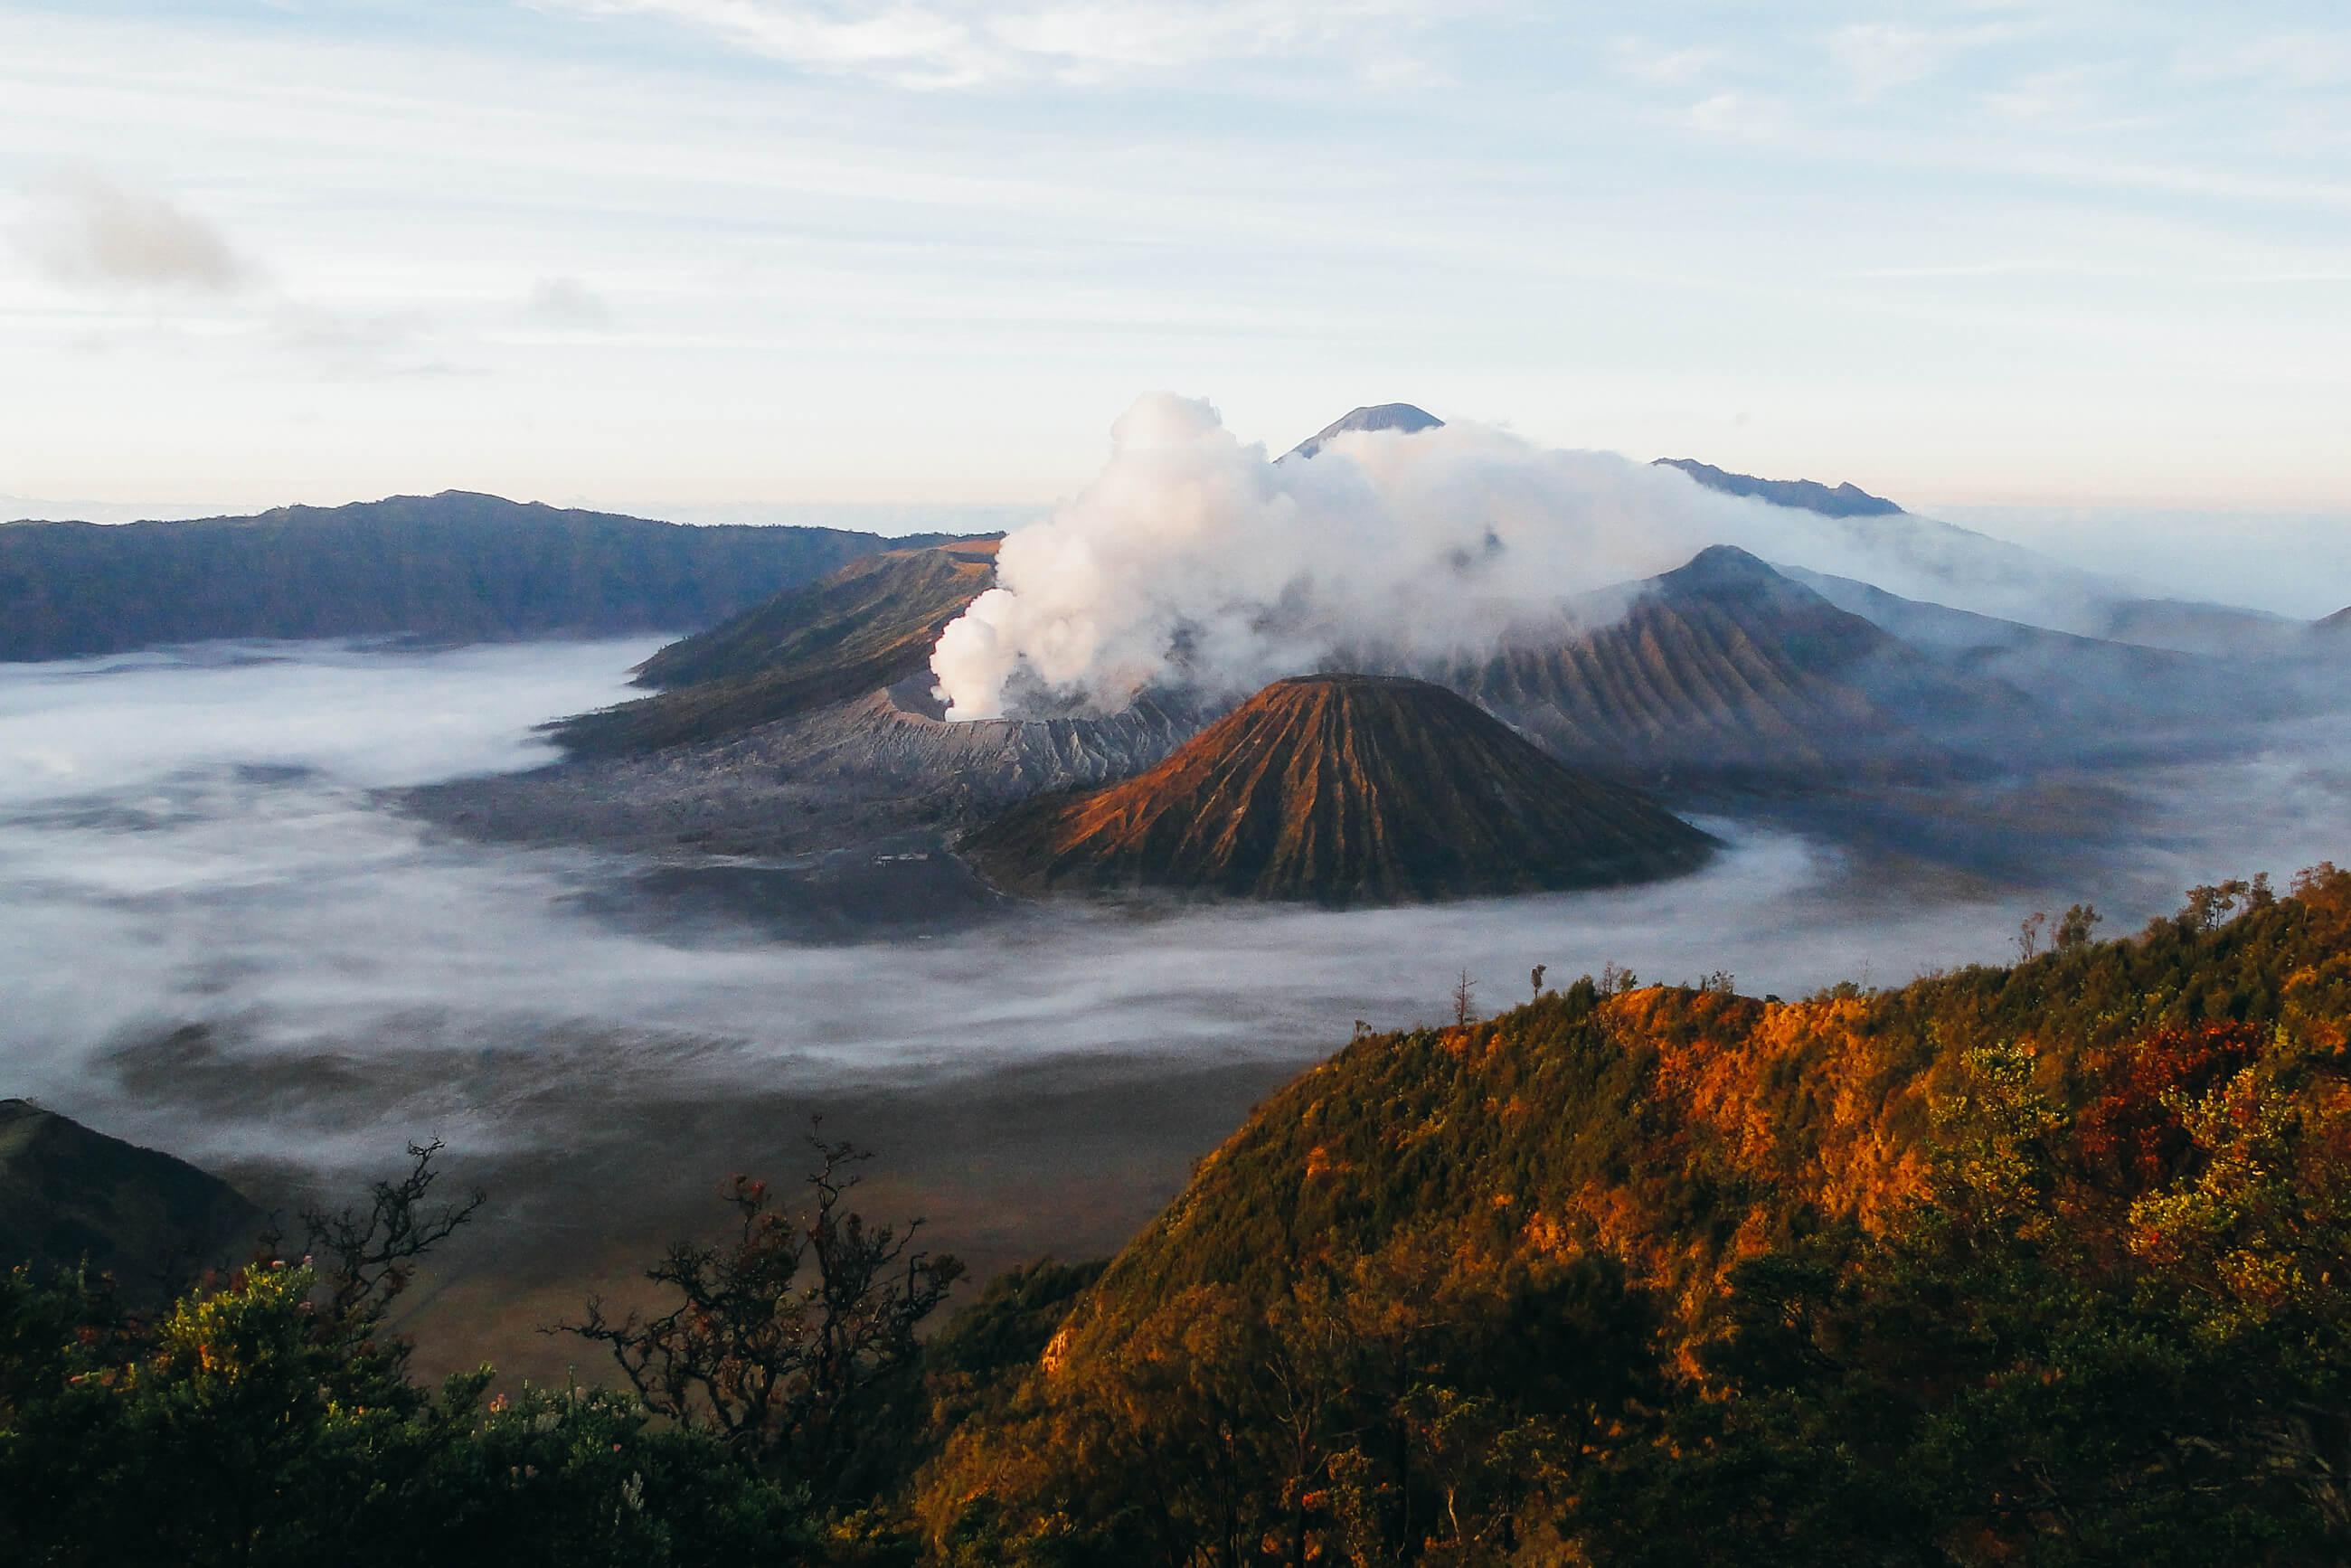 https://bubo.sk/uploads/galleries/7304/archiv_indonezia_java_bromo_dsc03120-17.jpg